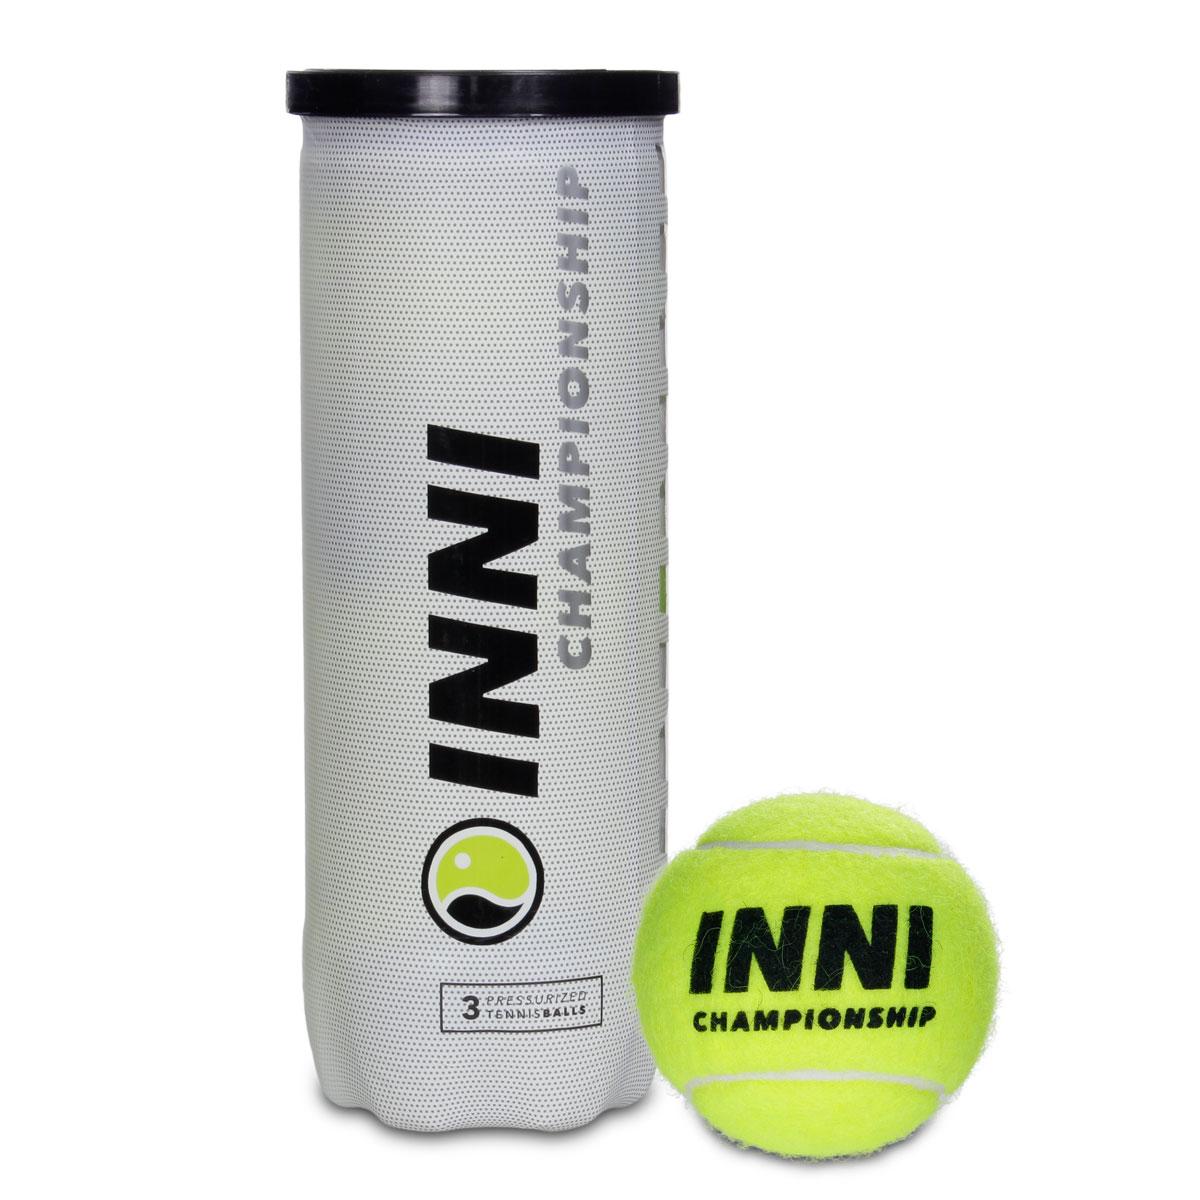 Bola De Tênis Inni Championship - 12 Tubos De 3 Bolas